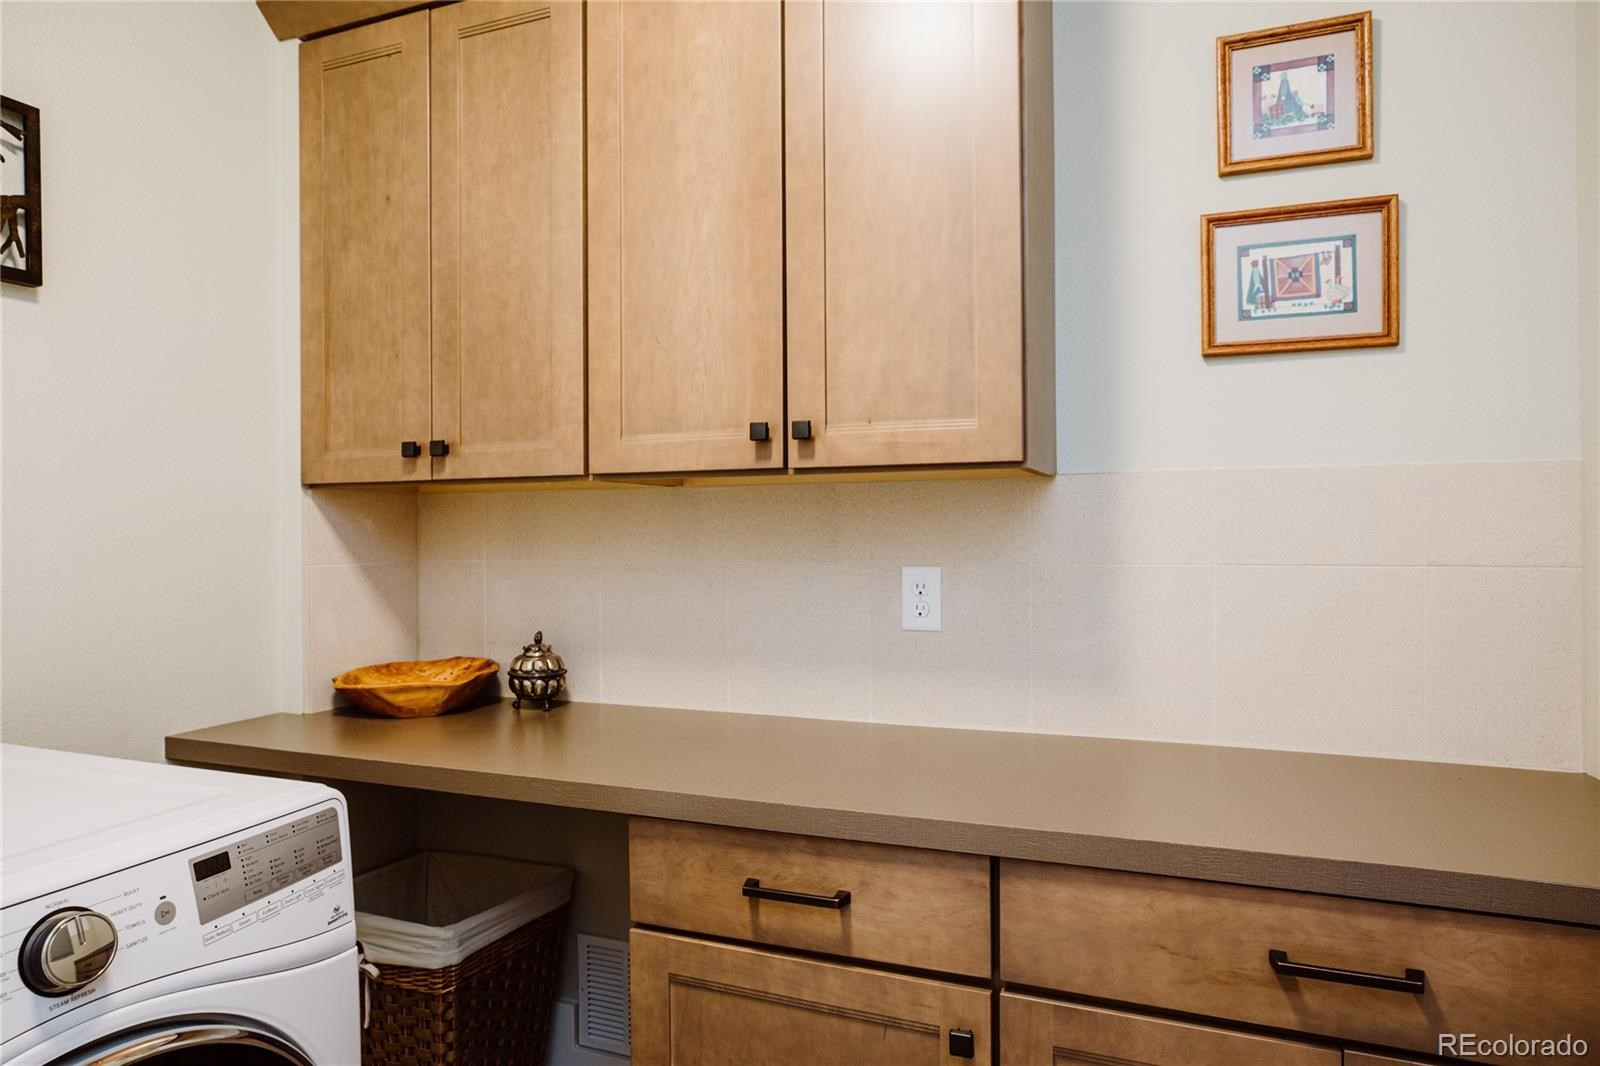 MLS# 3459910 - 19 - 712 Centre Avenue #203, Fort Collins, CO 80526